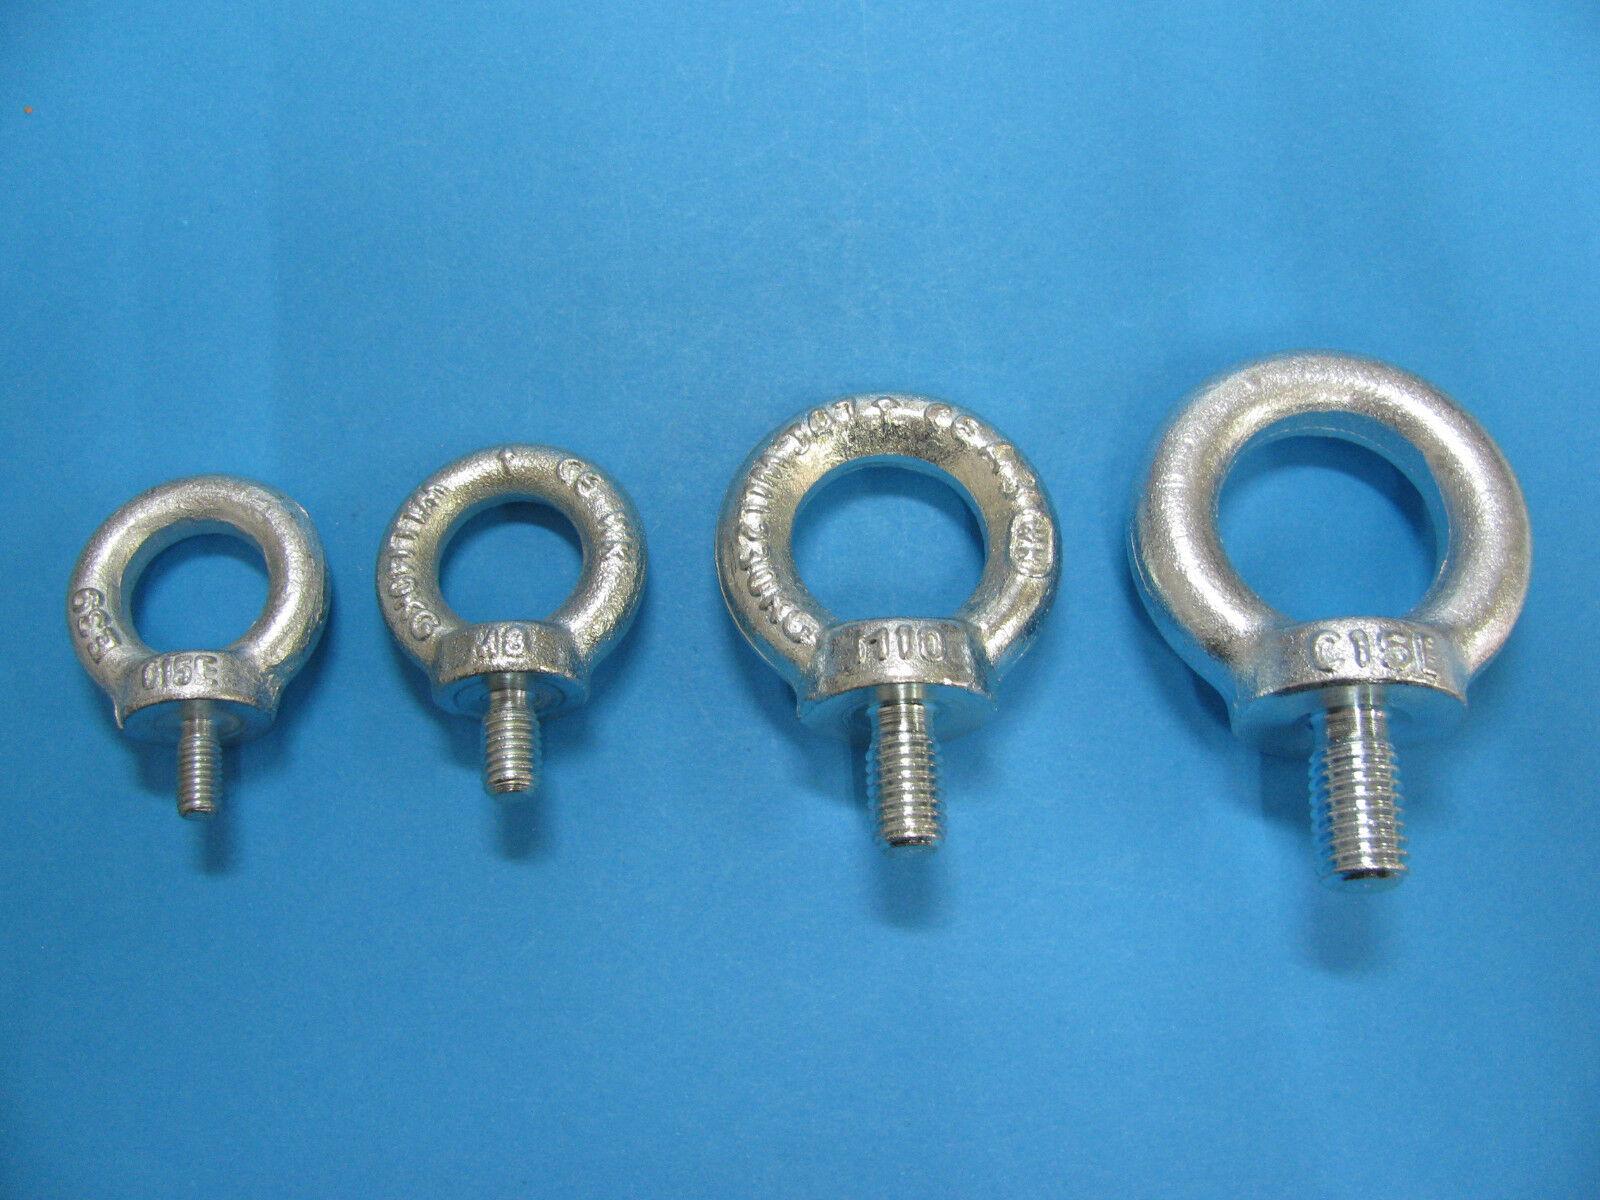 Ringschrauben Ösenschrauben C15 E verzinkt DIN 580 M6-M12 Augenschraube